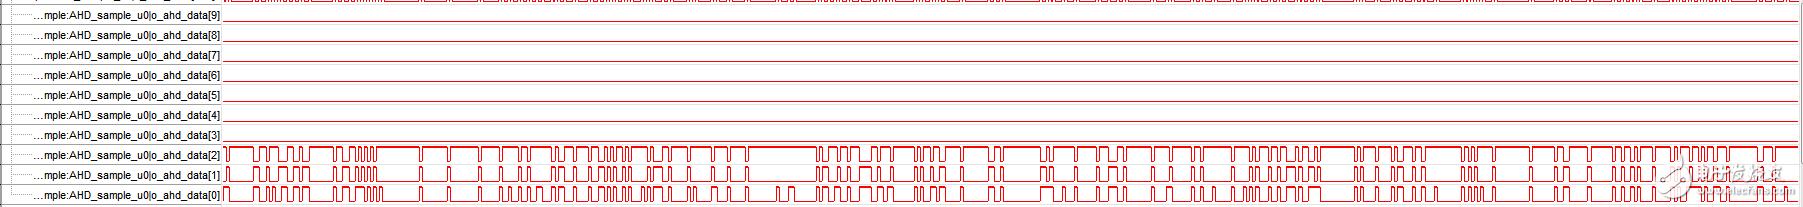 AD9211输出波形问题